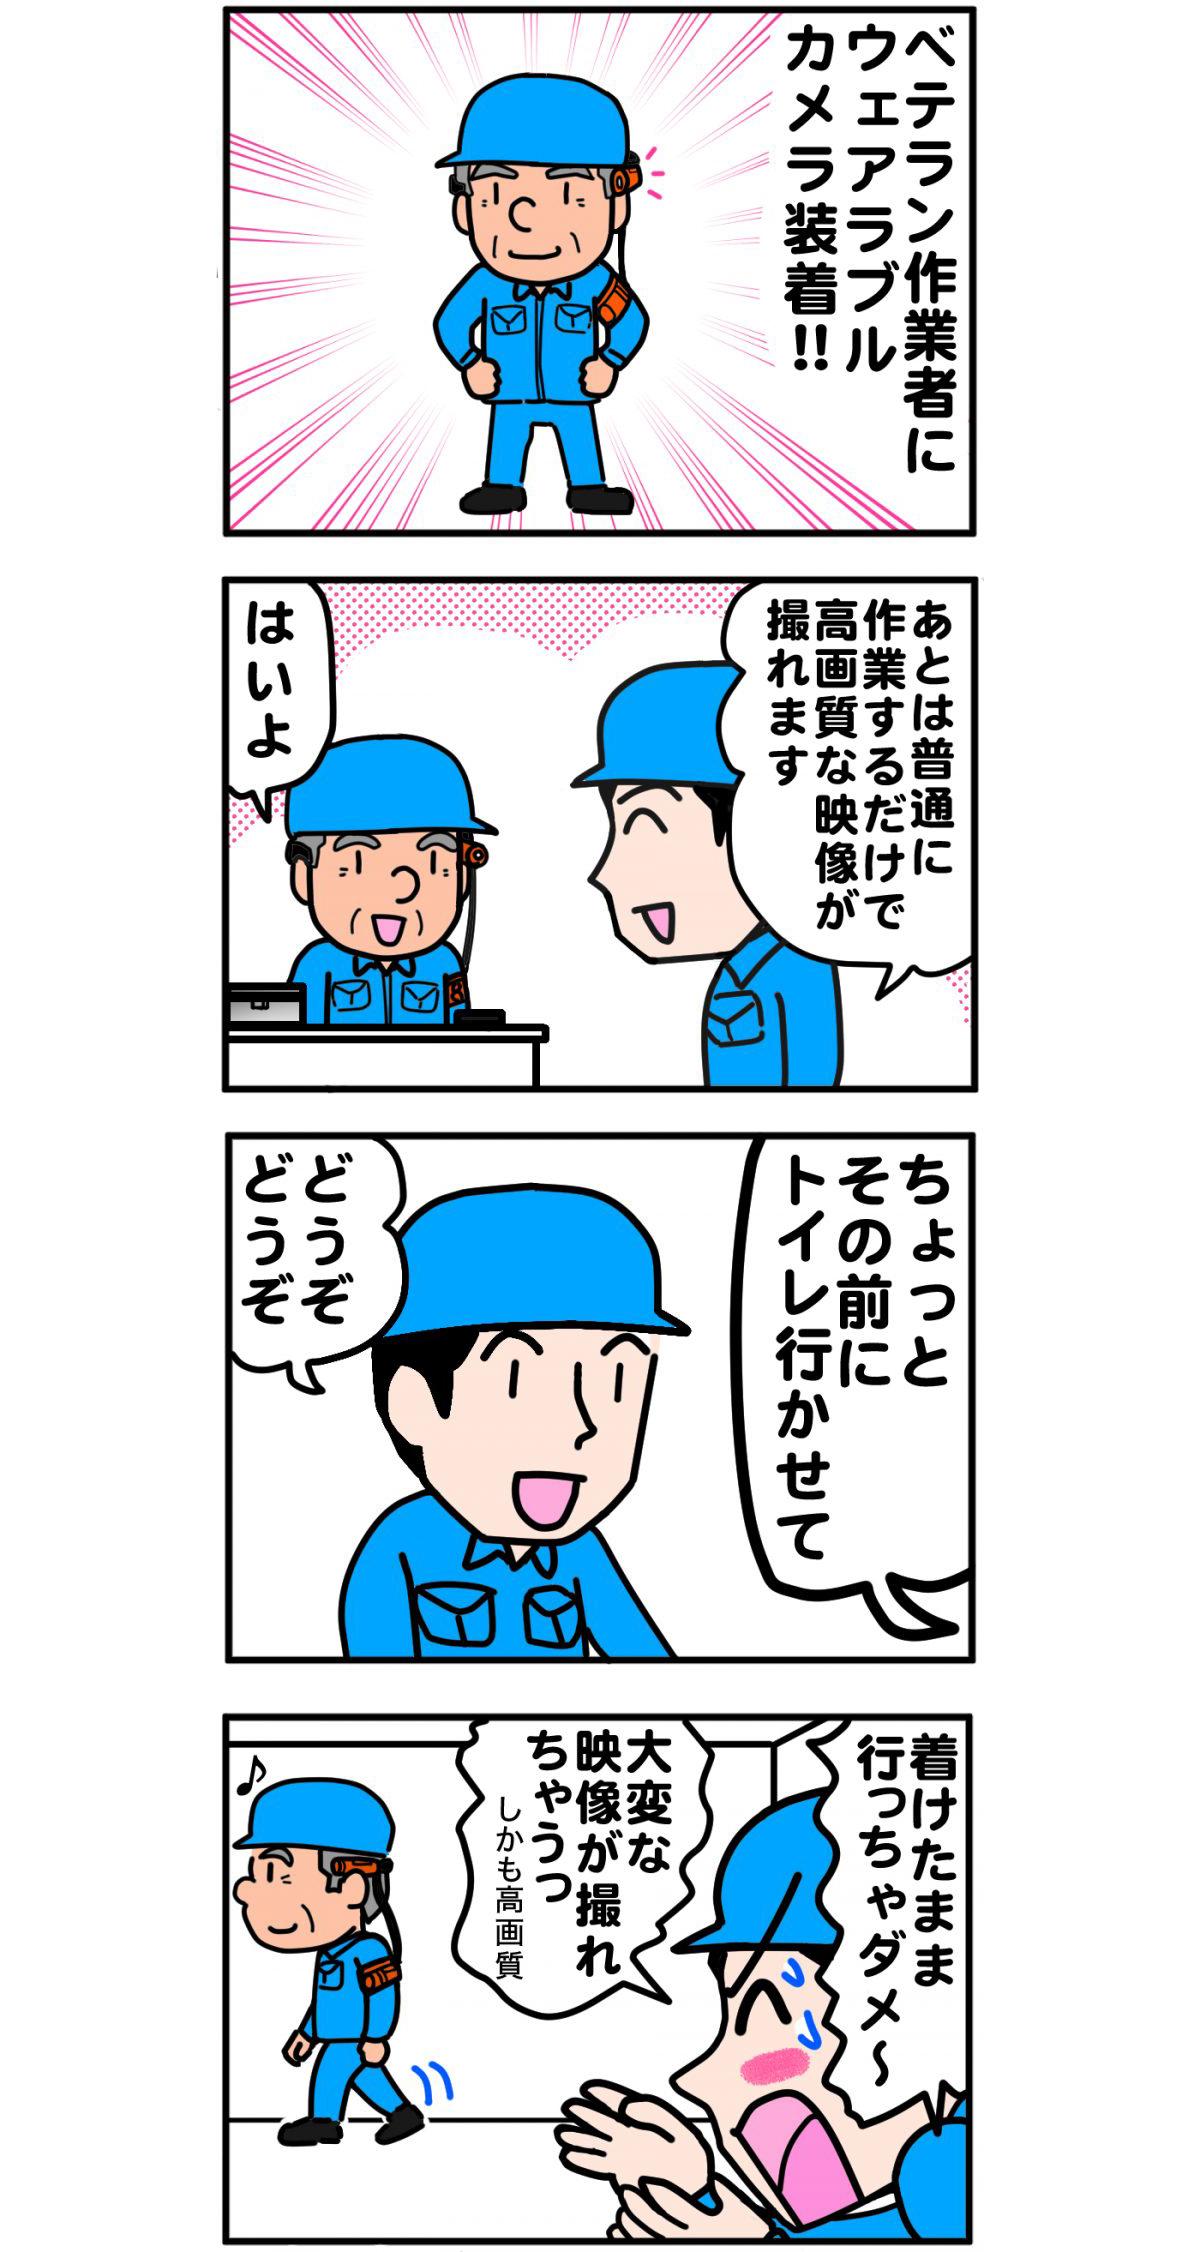 kaizen00